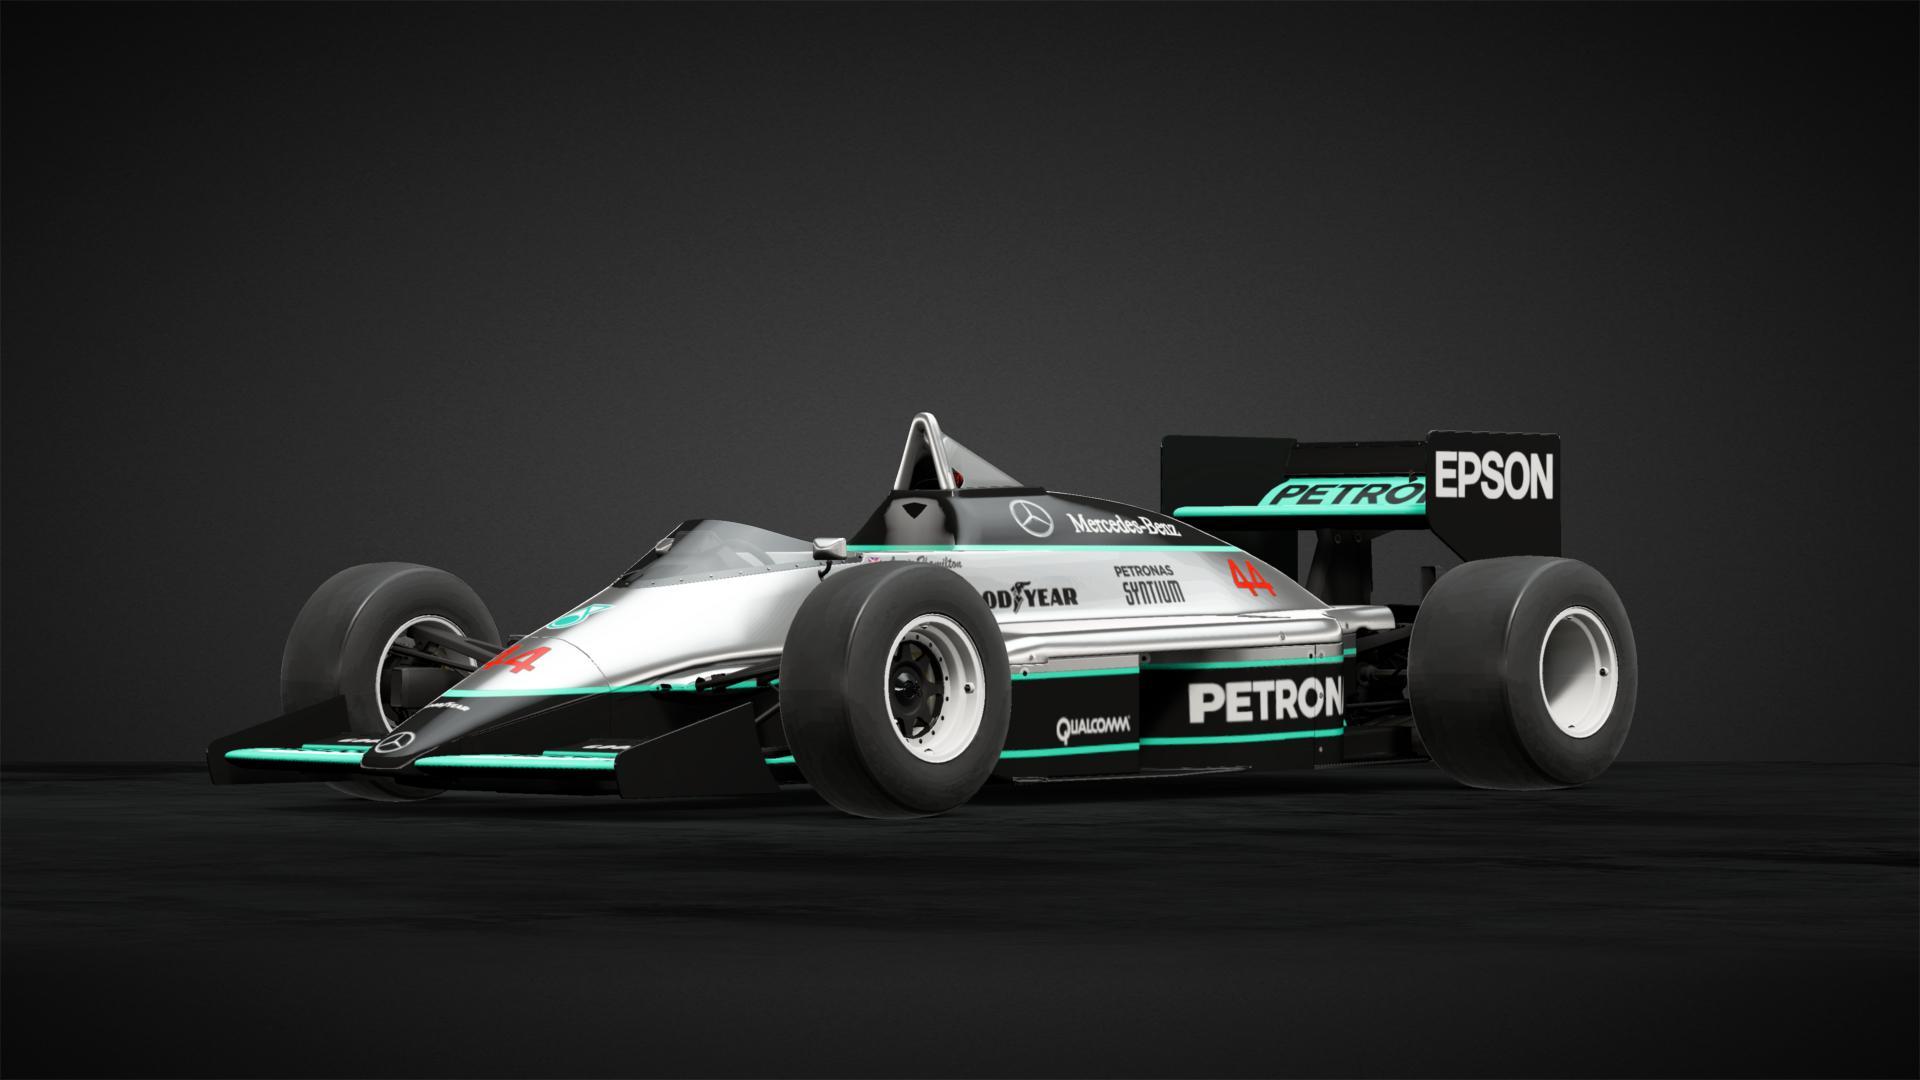 Lewis Hamilton 1986 Car Livery by JC munity